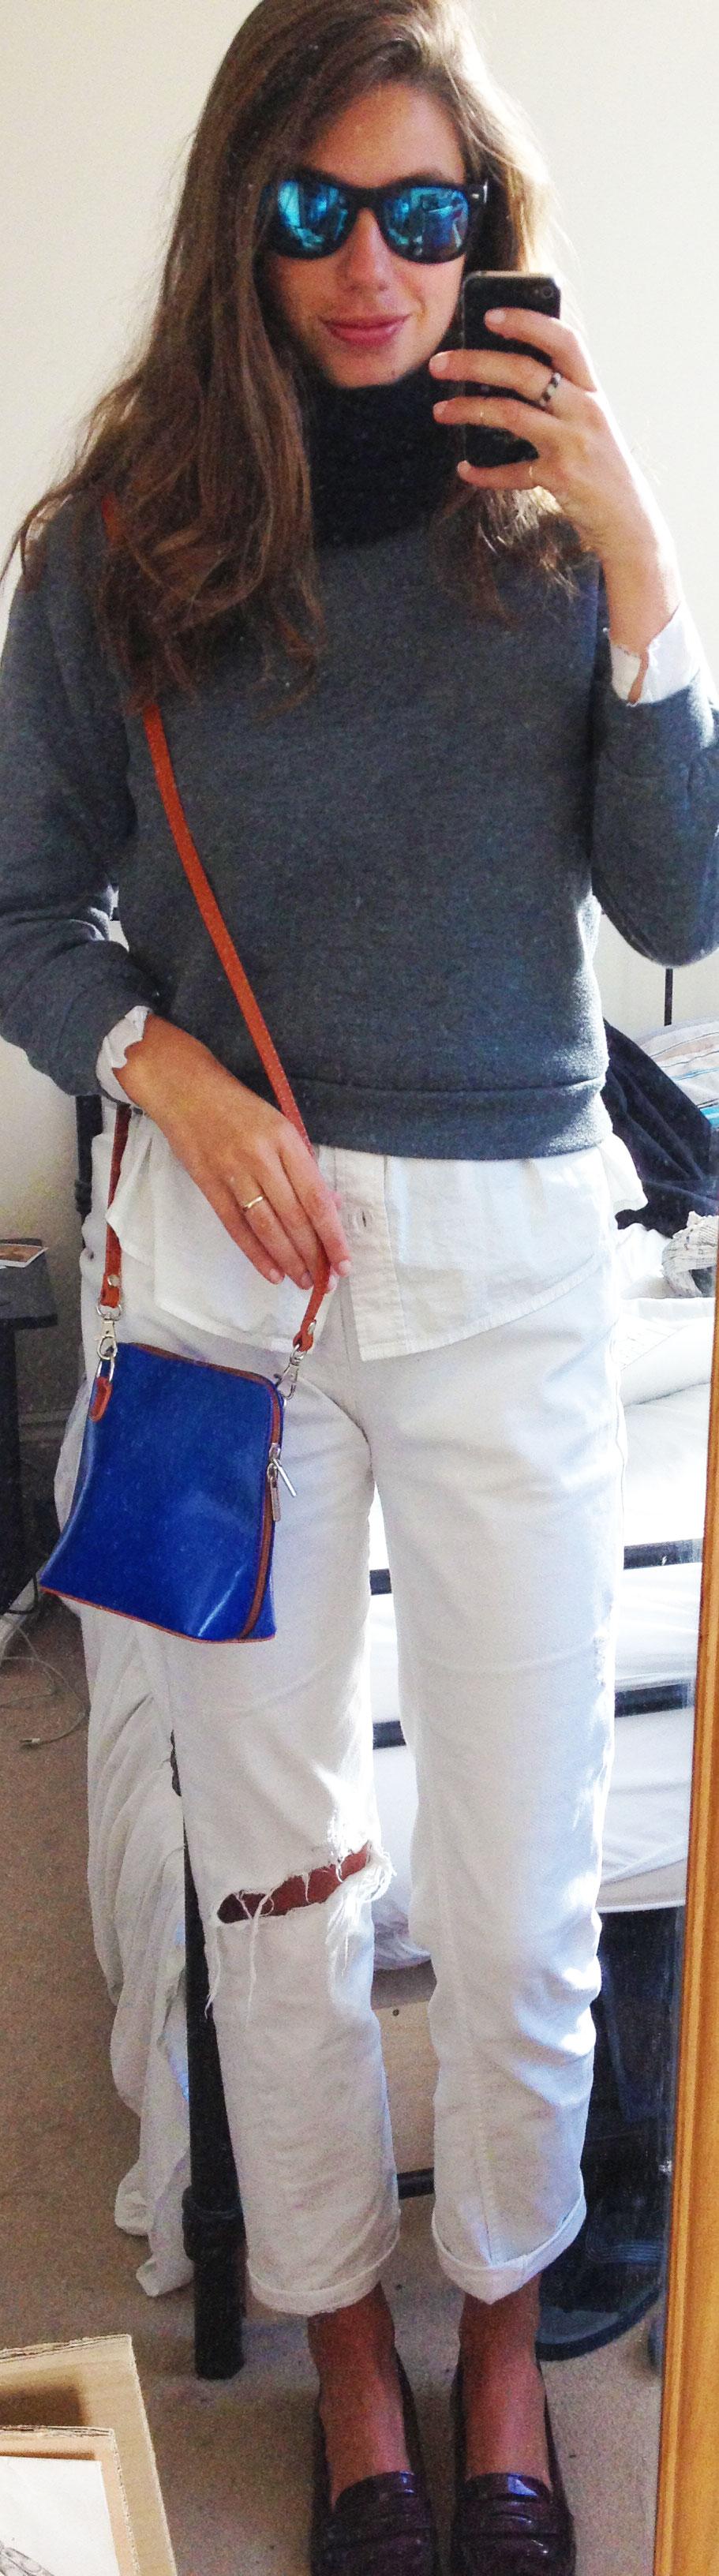 White Boyfriend Jeans ,  Grey Sweatshirt ,  Target White Button-Down Shirt ,  L.K.Bennett Leather Loafers ,  Cobalt Blue Crossbody Bag